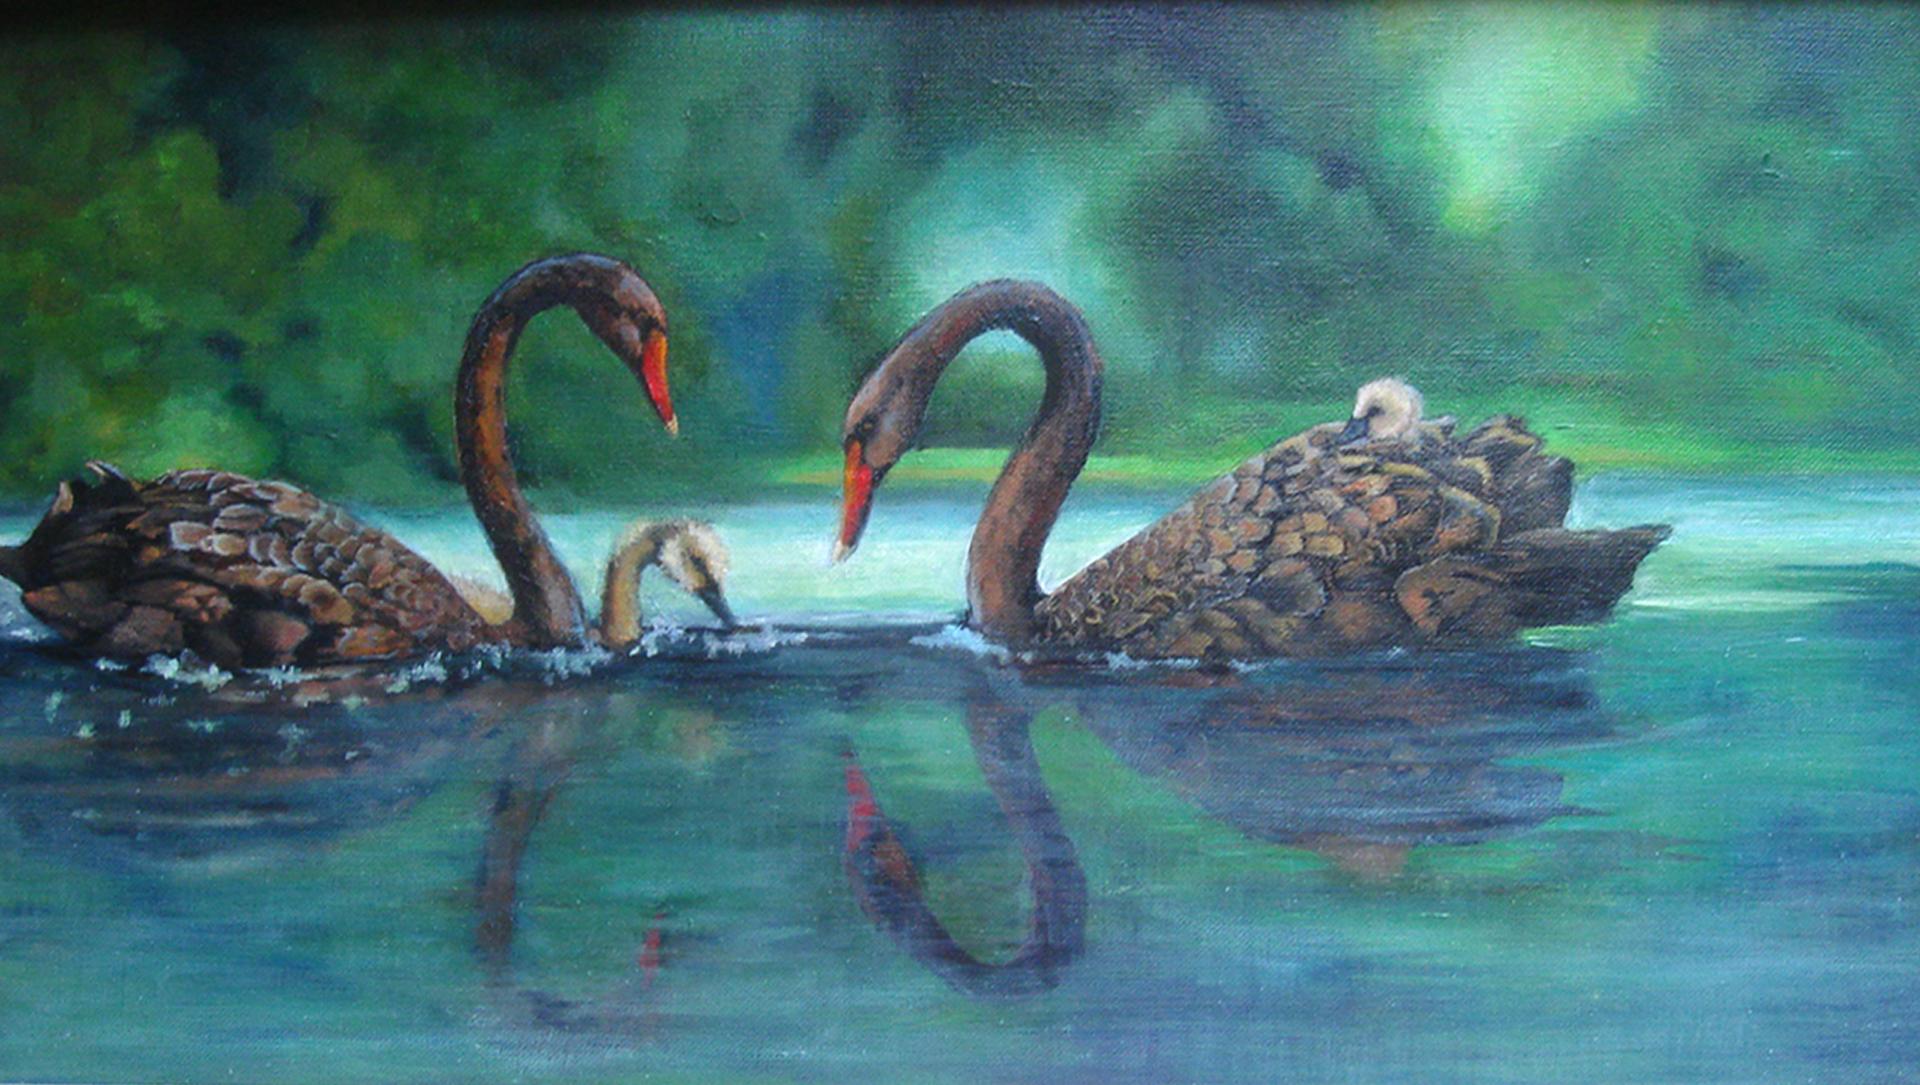 "<br><br>""Swans"" by Deborah B. - 2-D Visual Arts (Adult)"